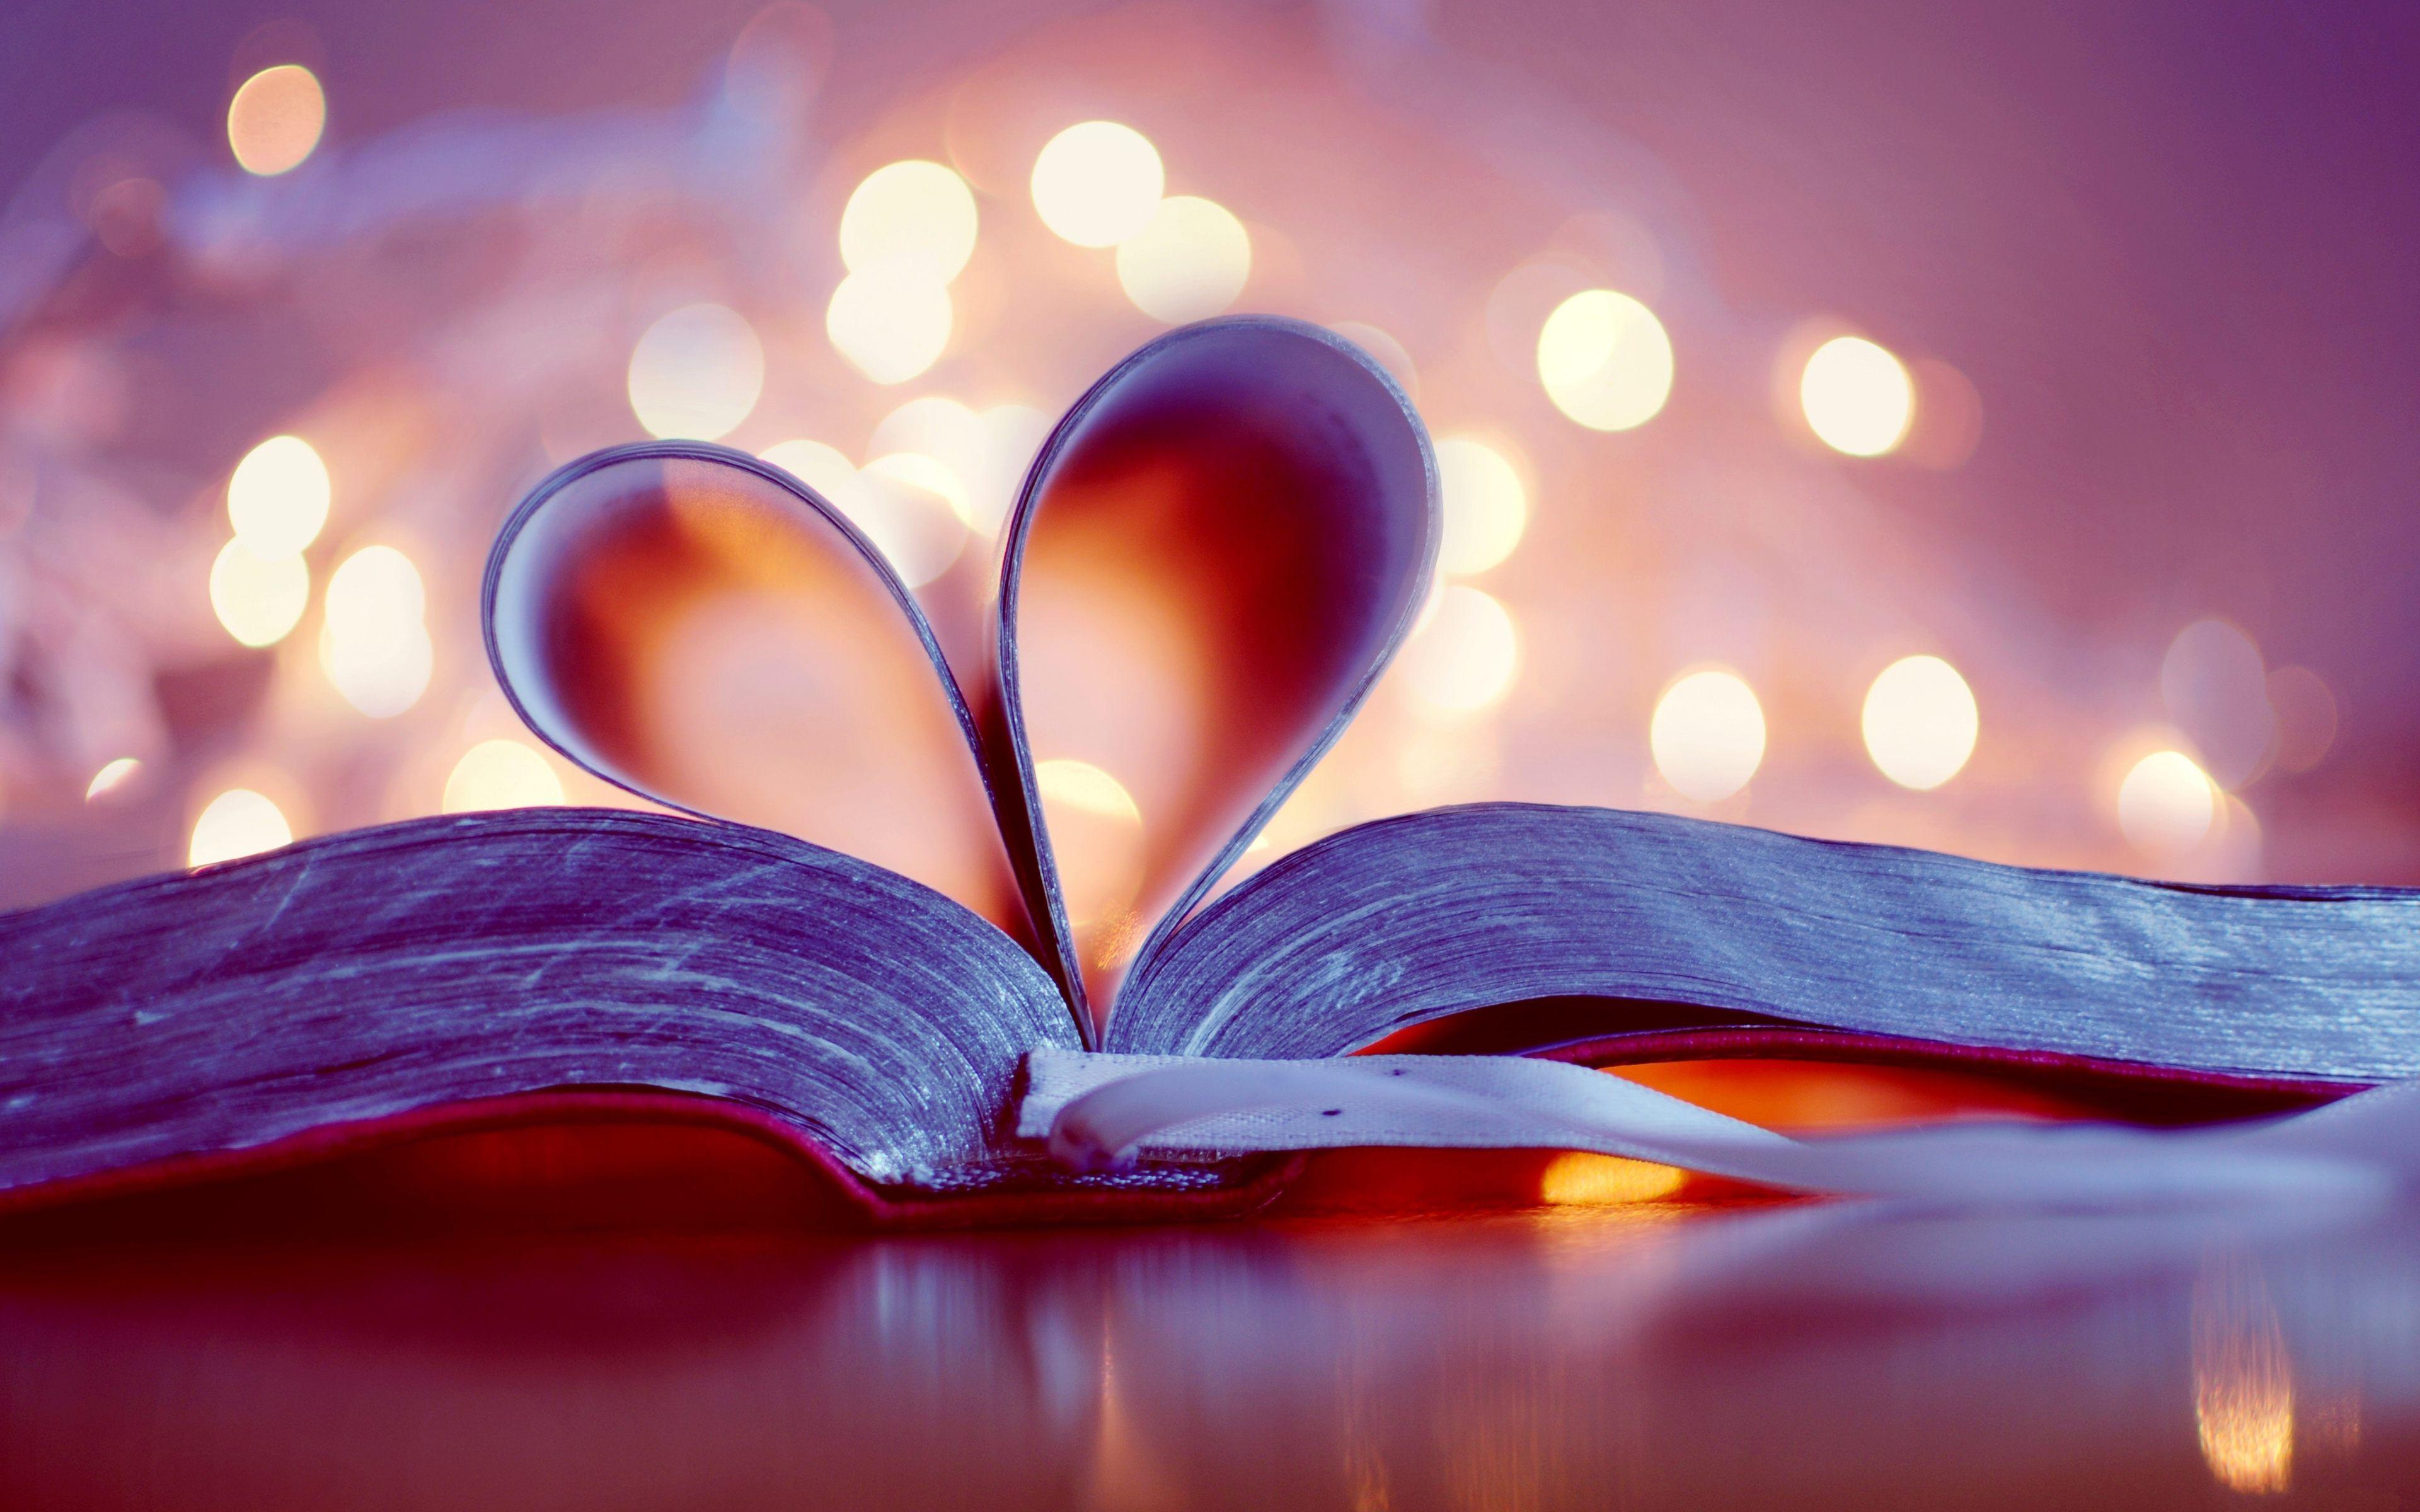 Love Book Heart Art 4k Wallpaper Jpg 3840